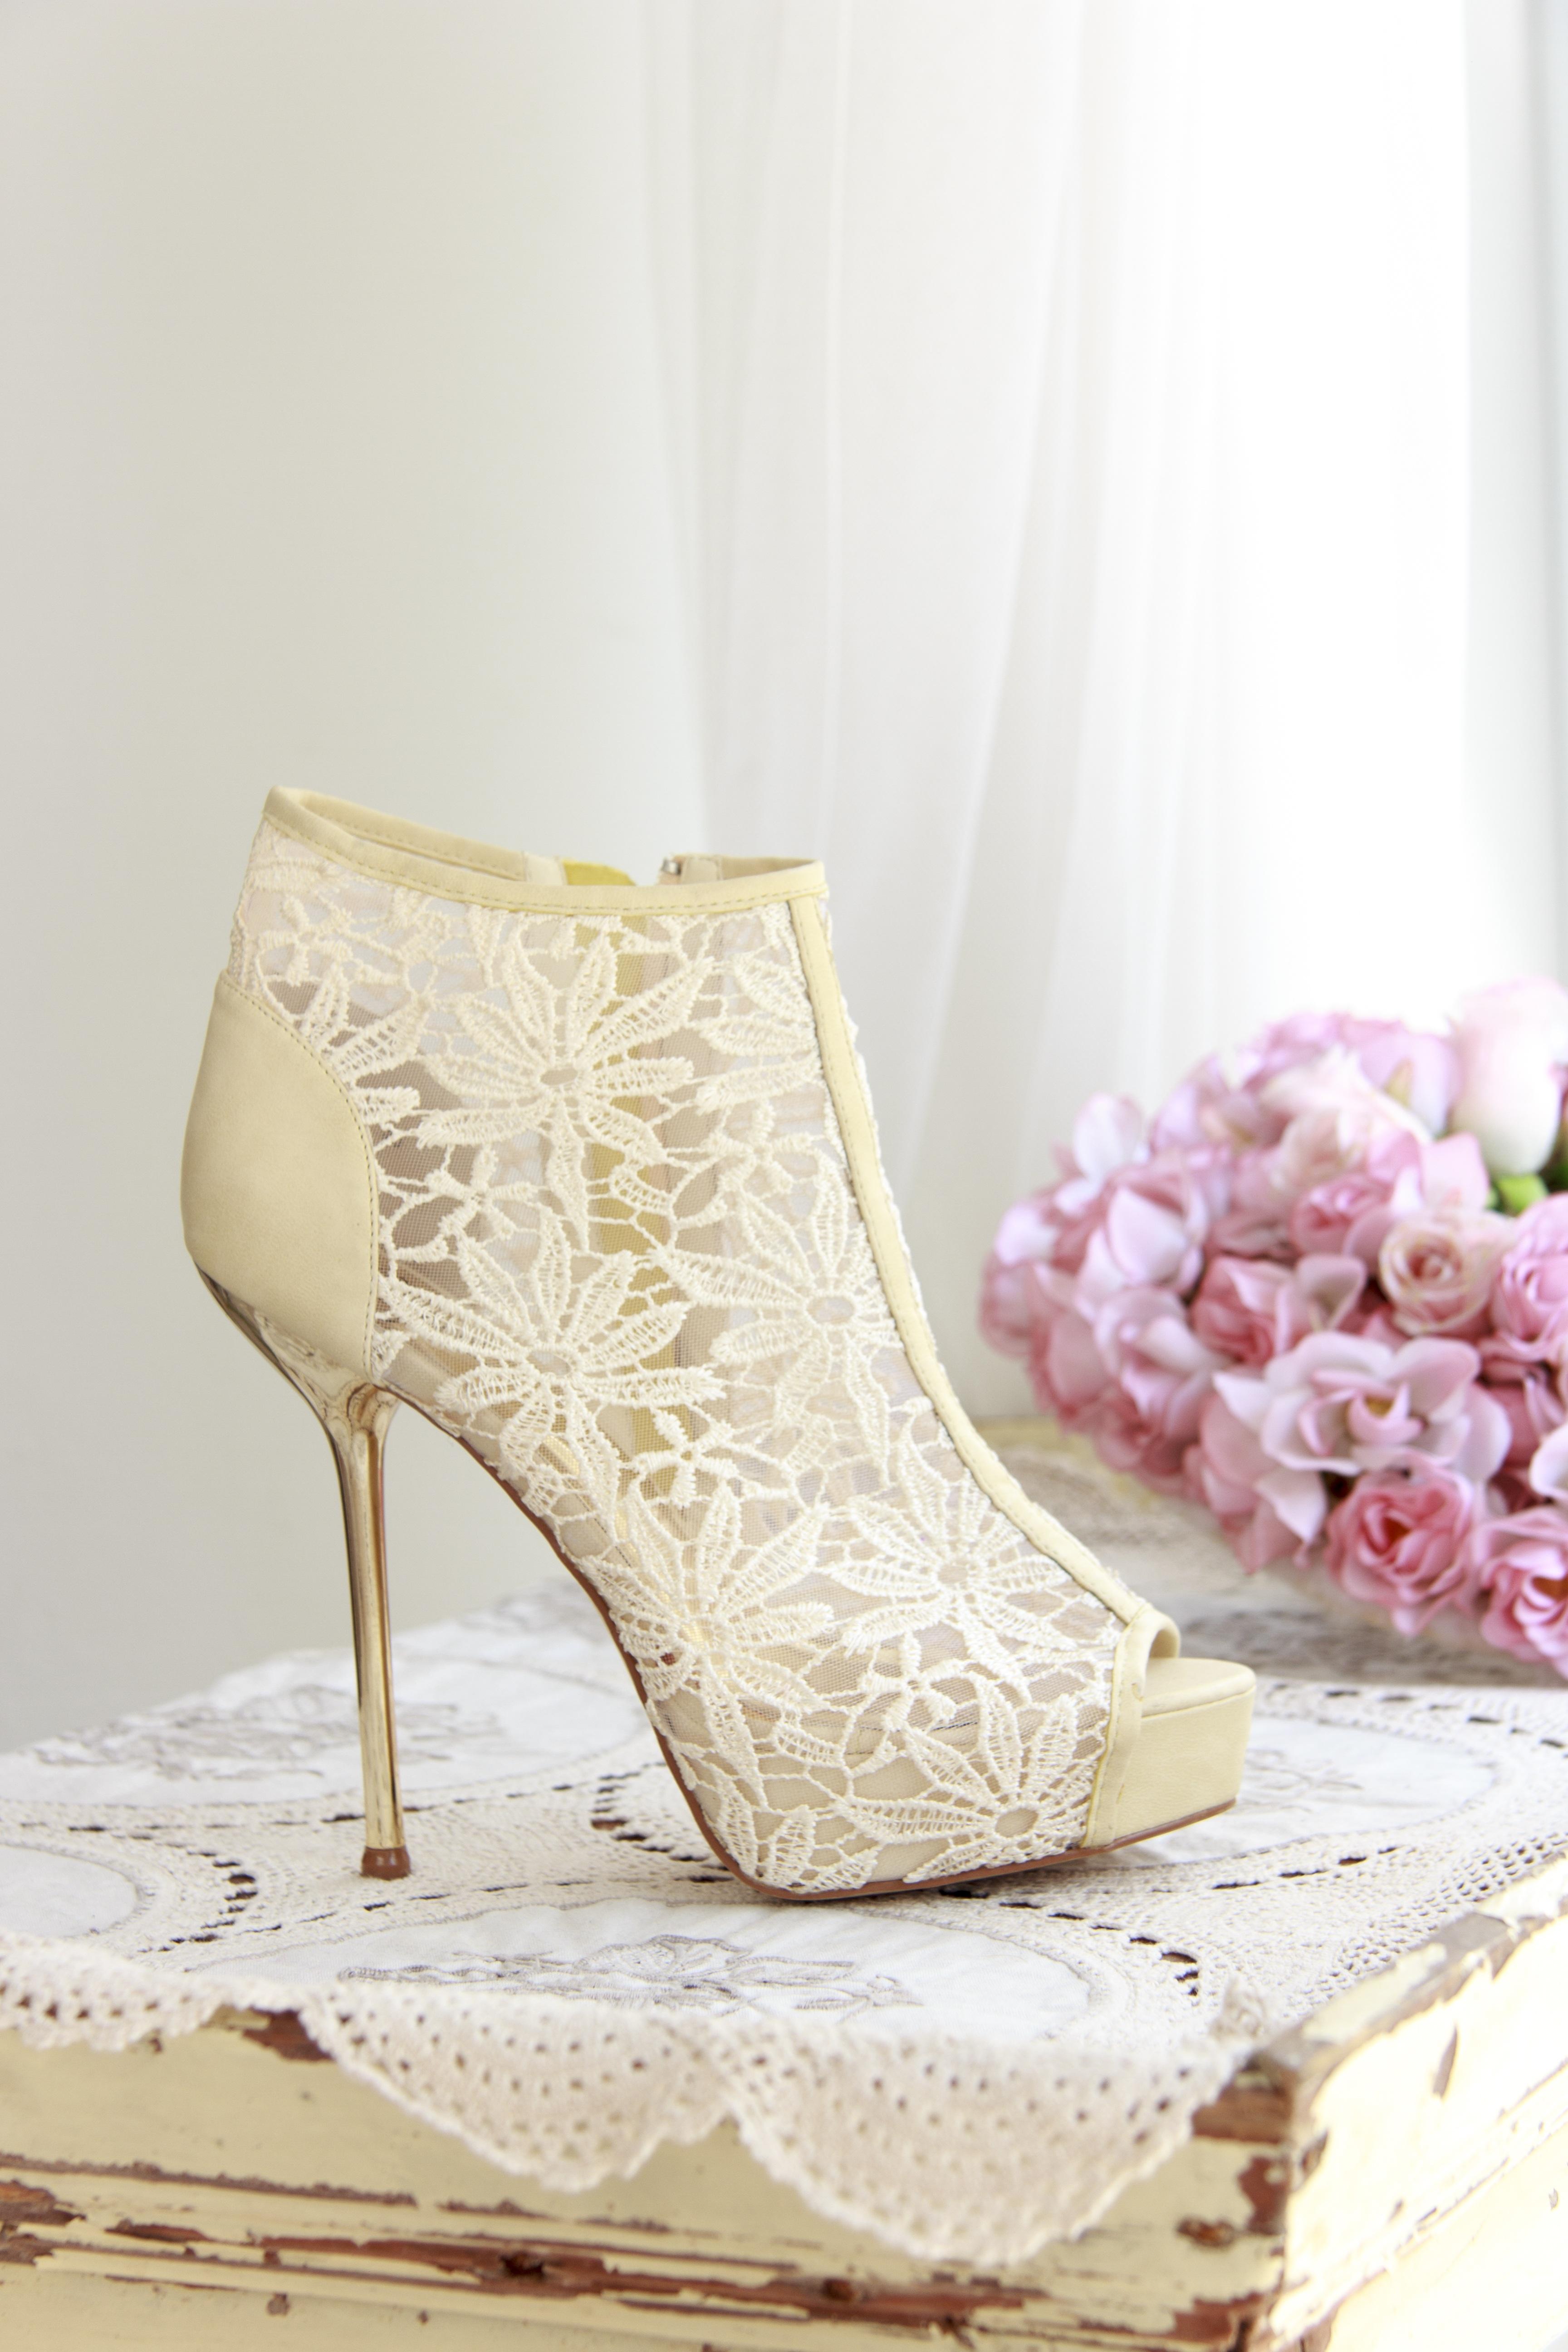 badea7629cc ... beauty, pretty, high heels 3456x5184. shoe white leg model spring  fashion furniture pink wedding dress human body product textile dress  footwear